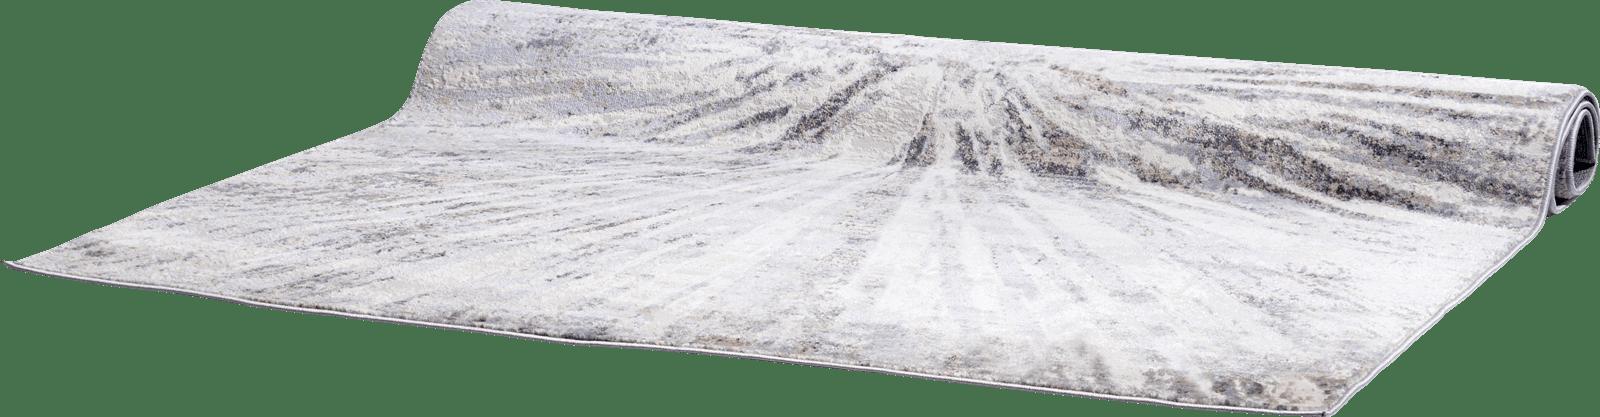 XOOON - Coco Maison - splash rug 200x300cm